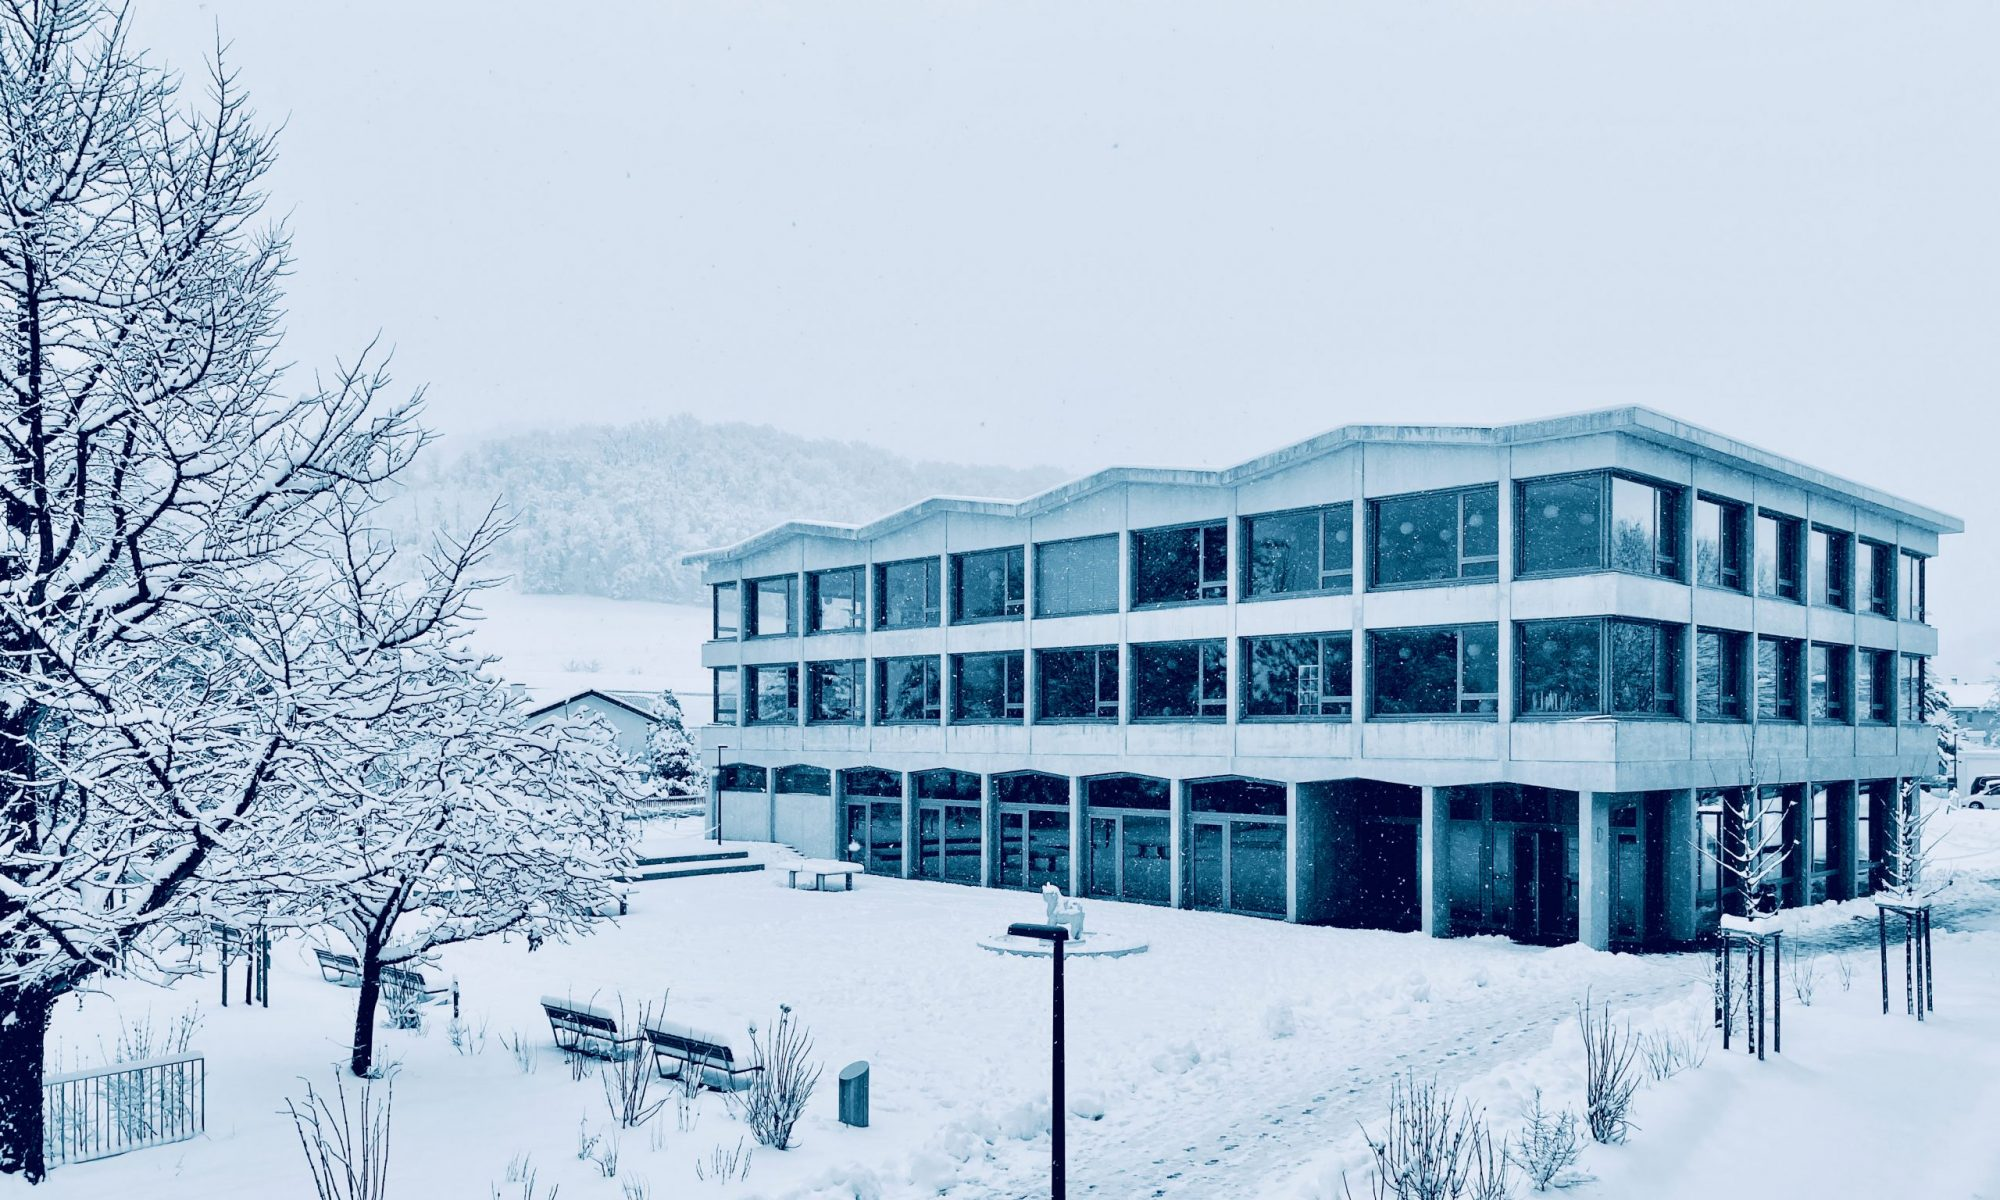 Sekundarschule Sissach